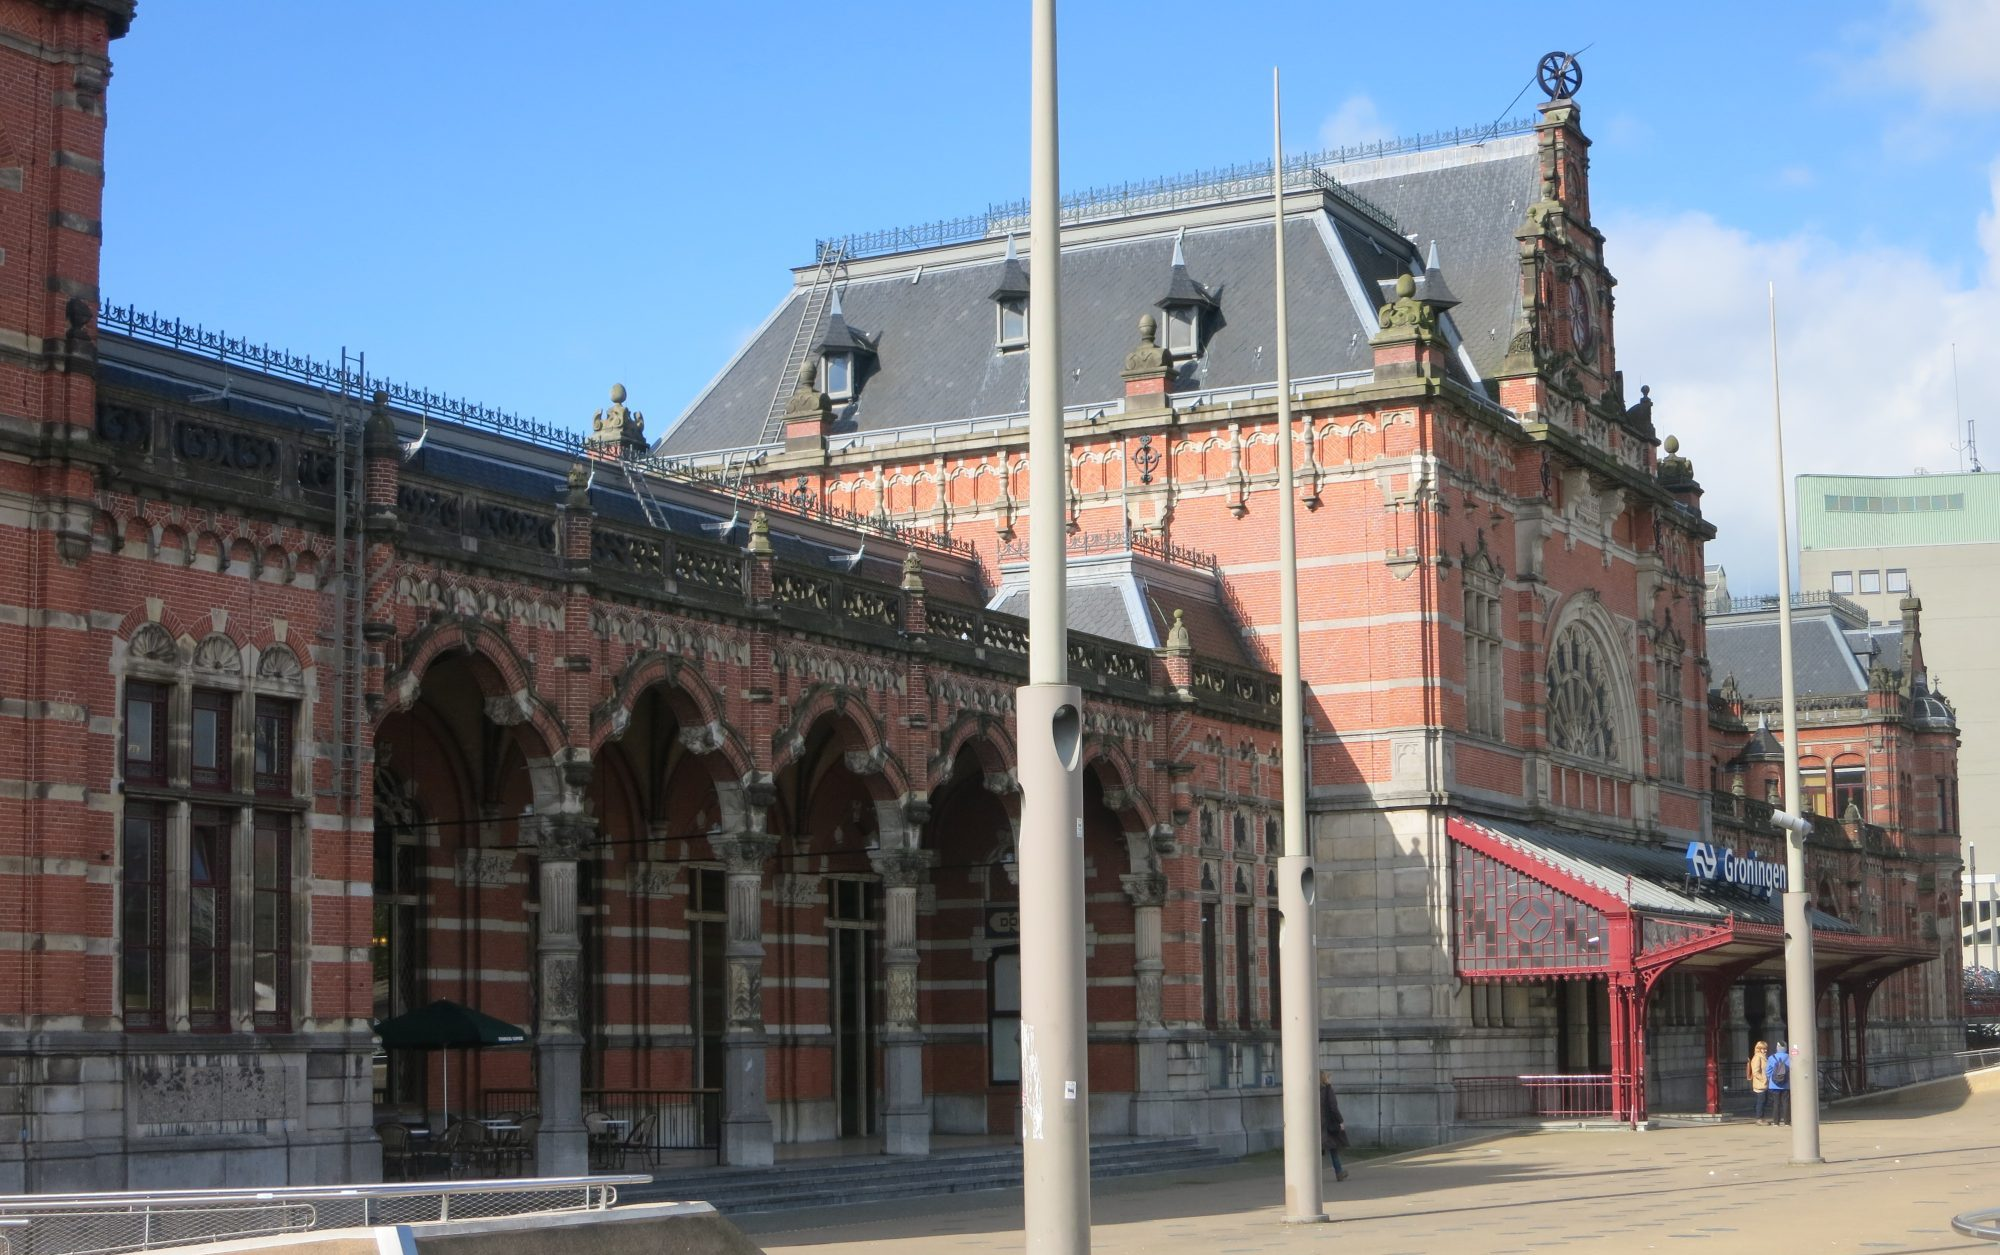 Groningen central train station